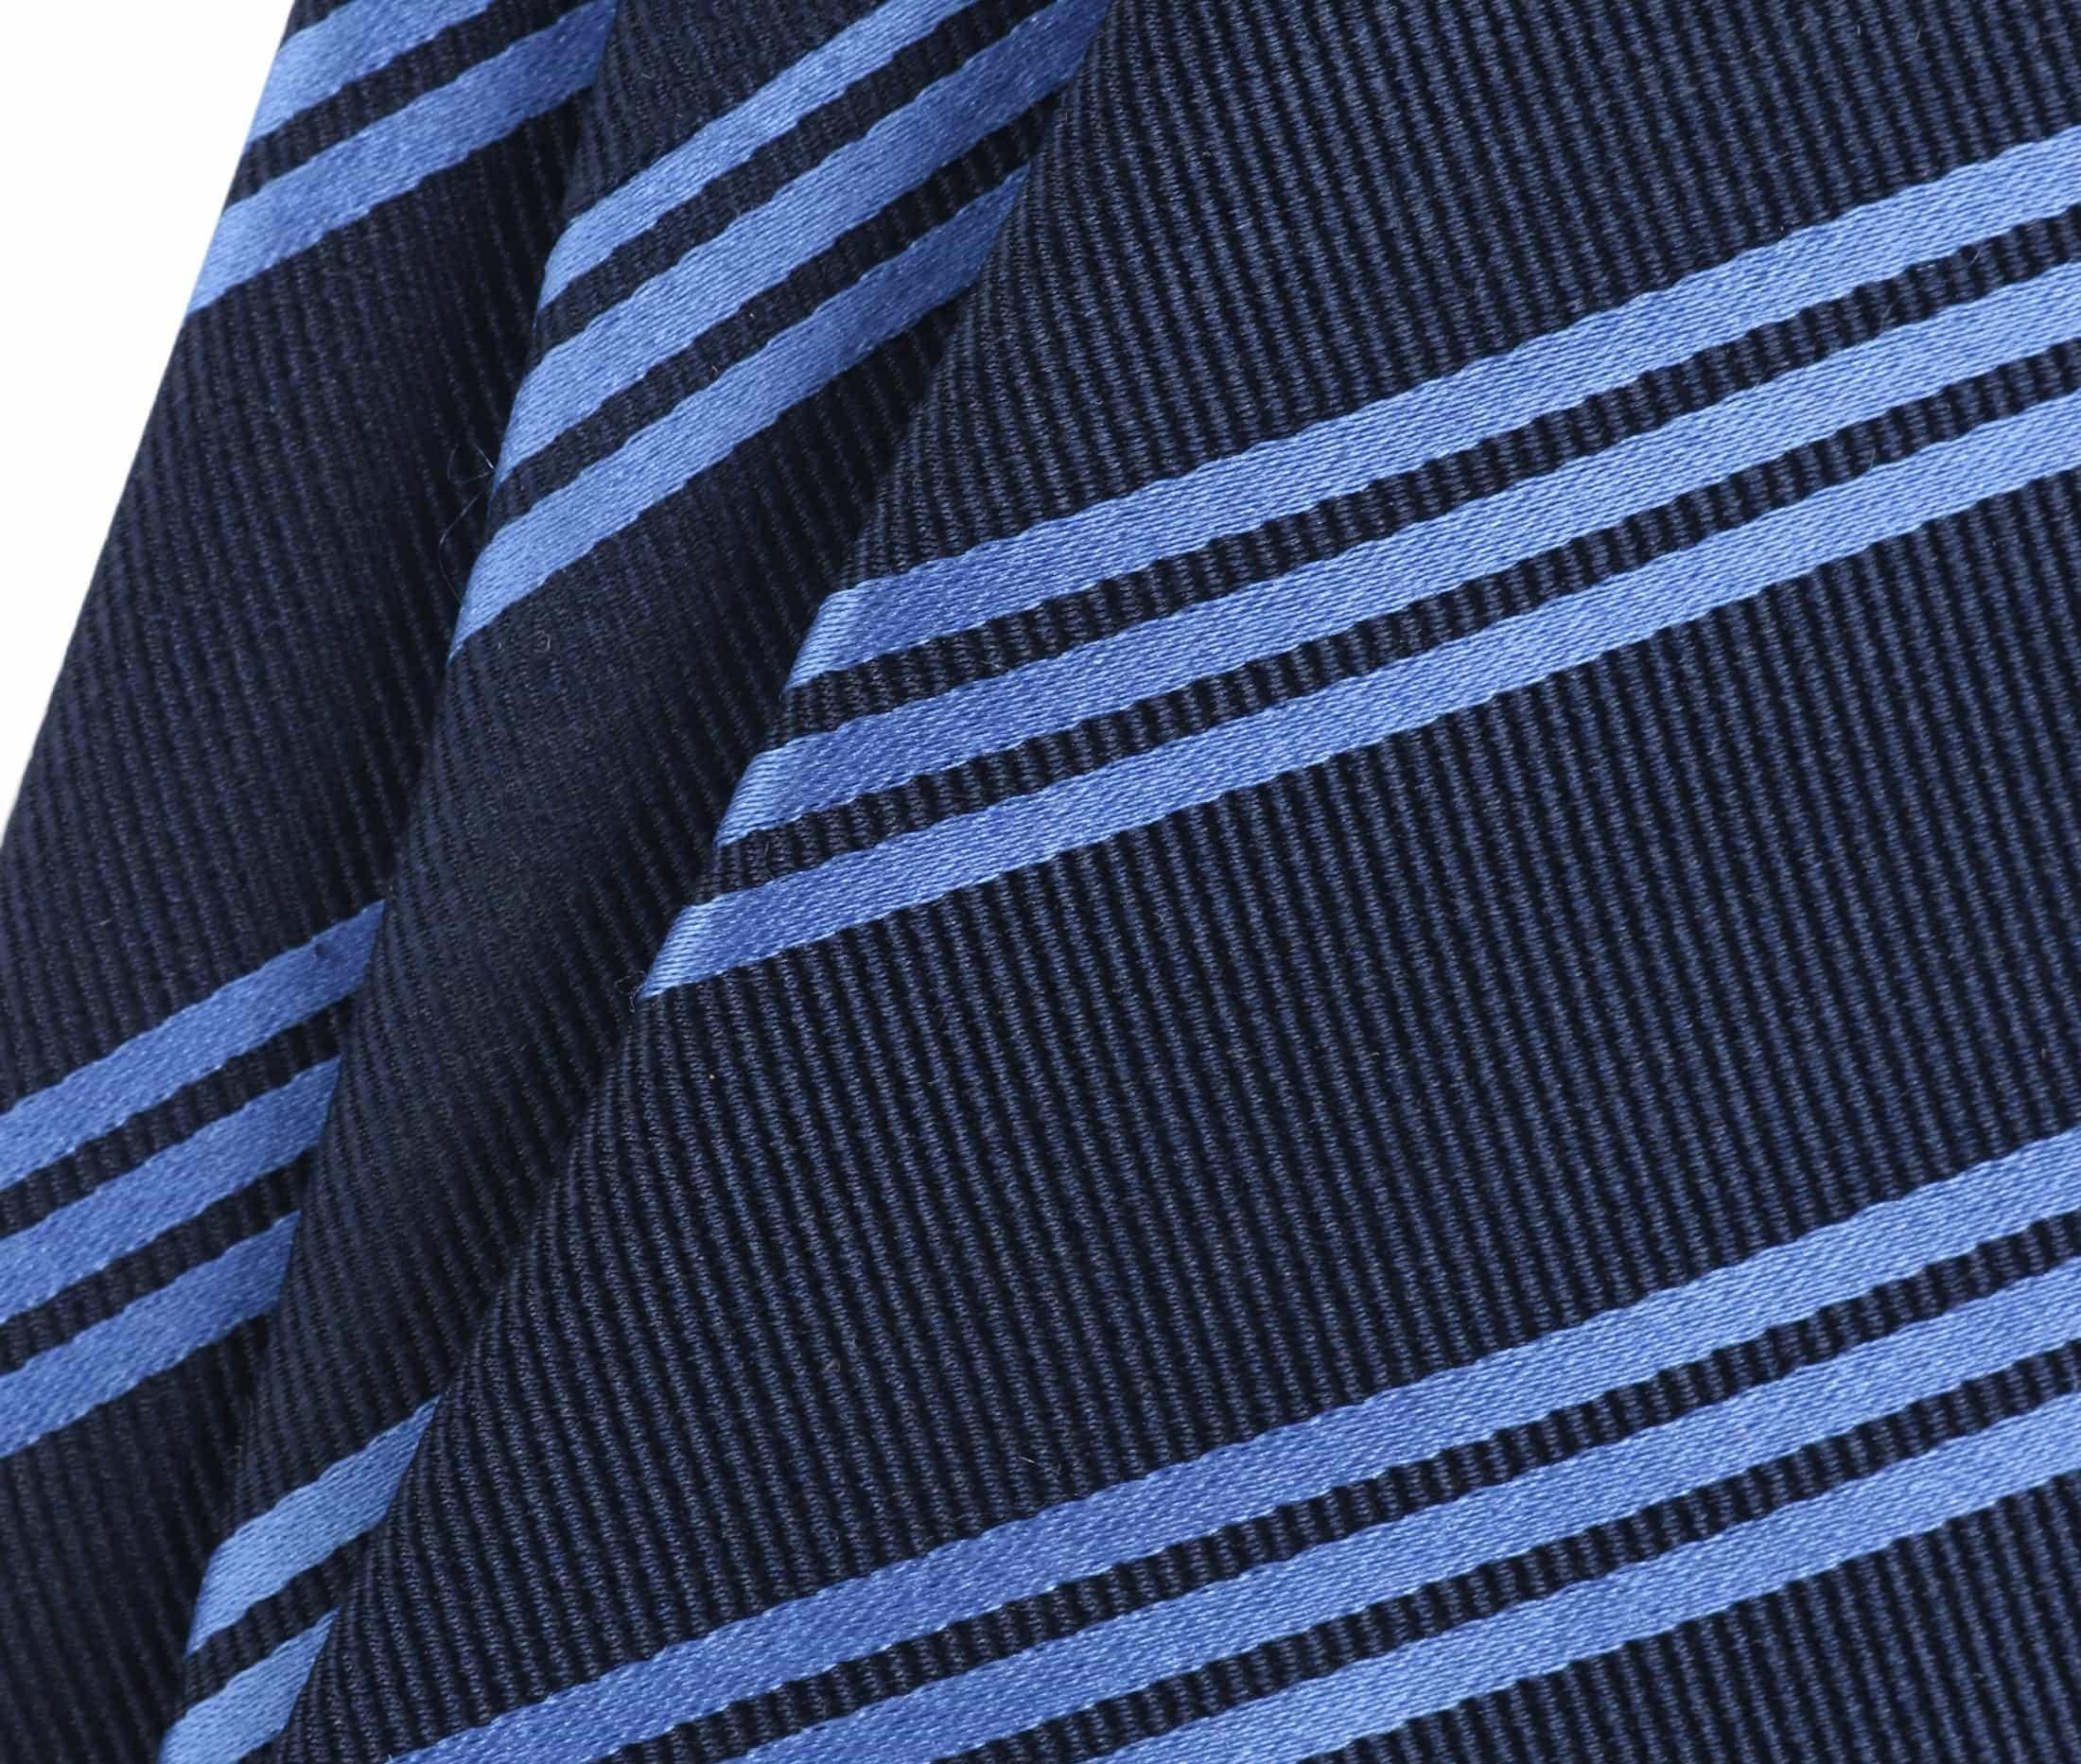 Krawatte Seide Streifen Navy Blau foto 1